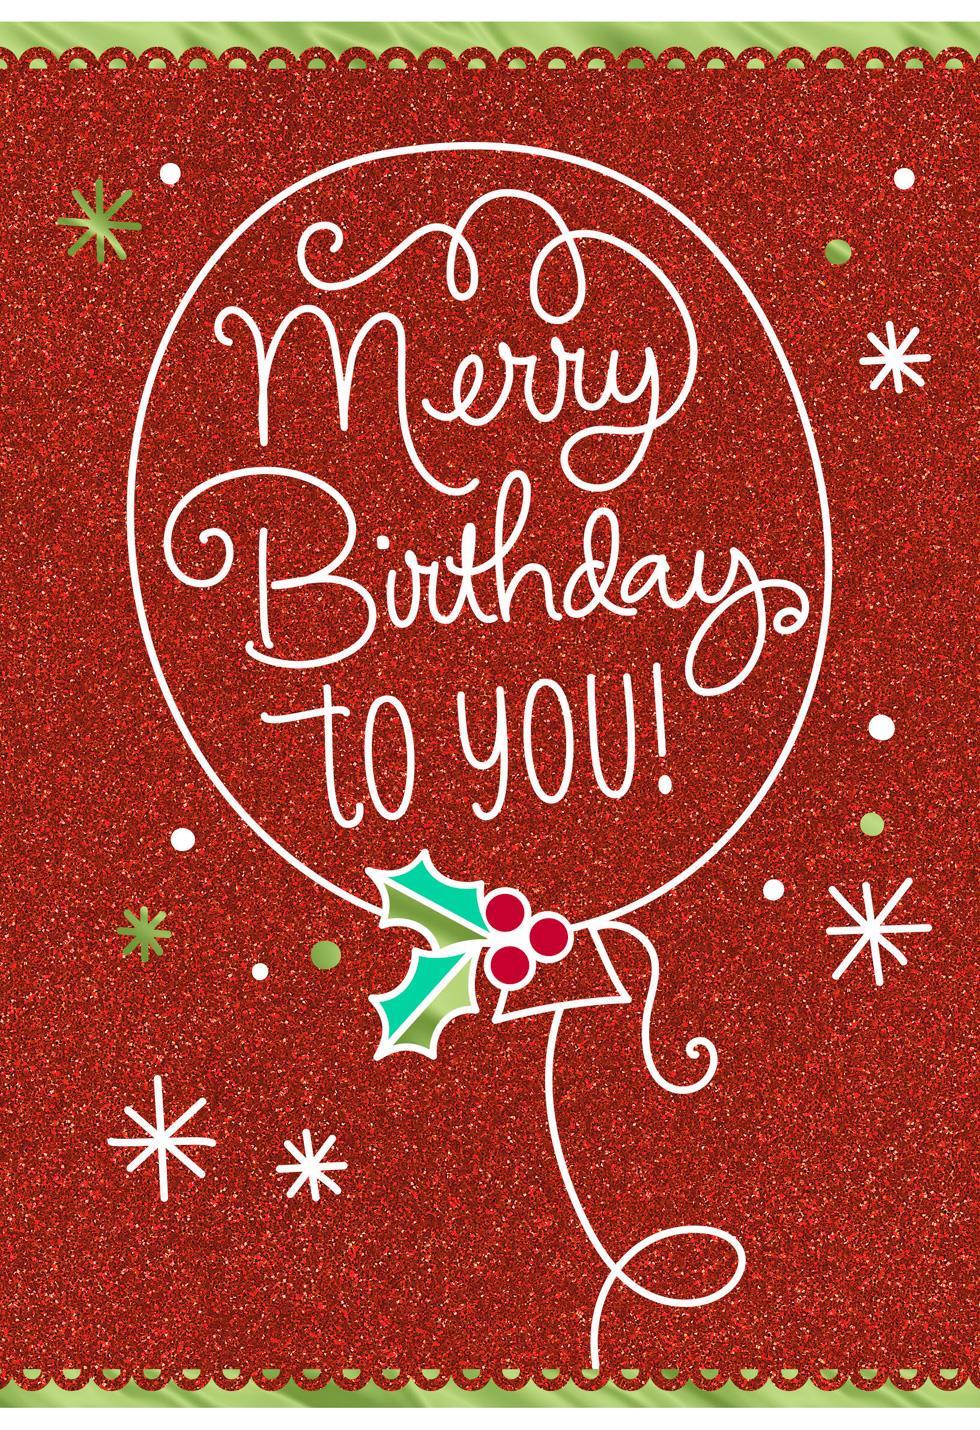 Merry birthday december 25th birthday christmas card greeting merry birthday december 25th birthday christmas card bookmarktalkfo Images